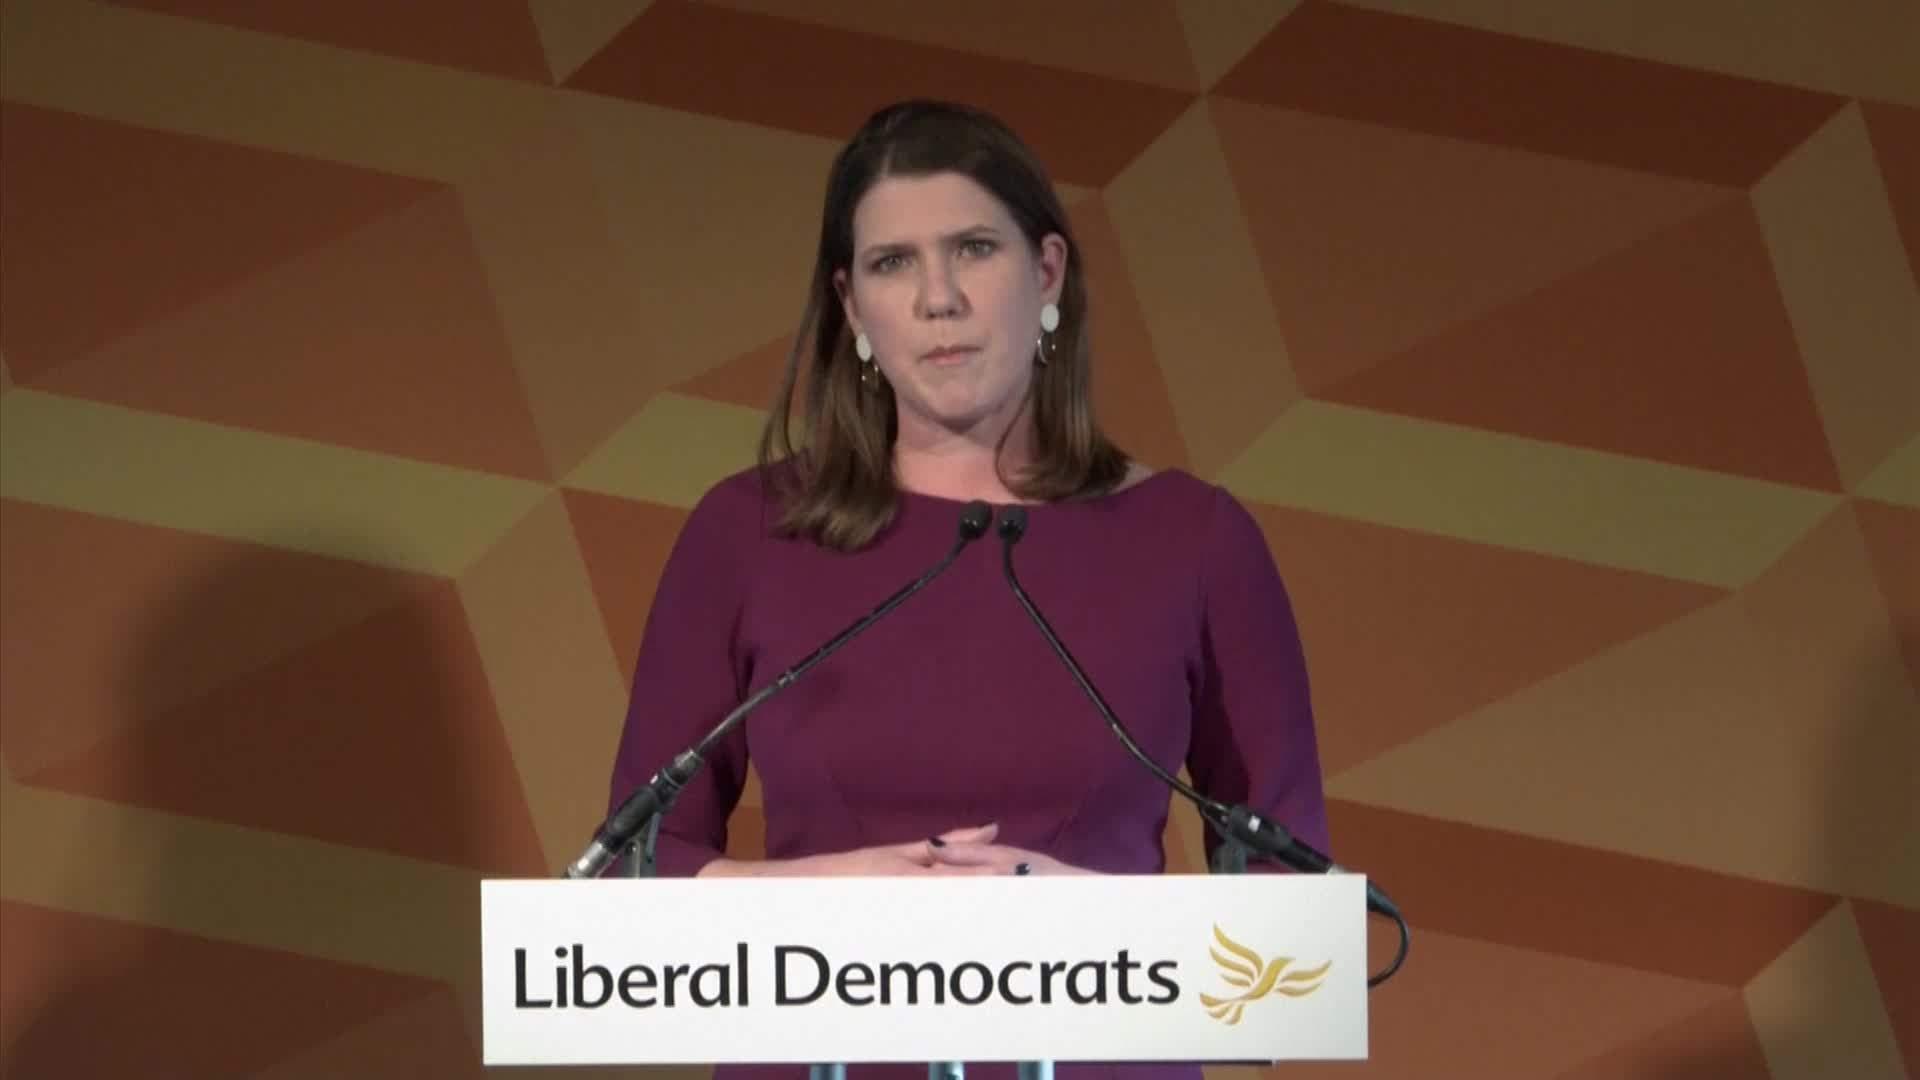 Swinson 'proud' of Lib Dems despite losing seat during General Election